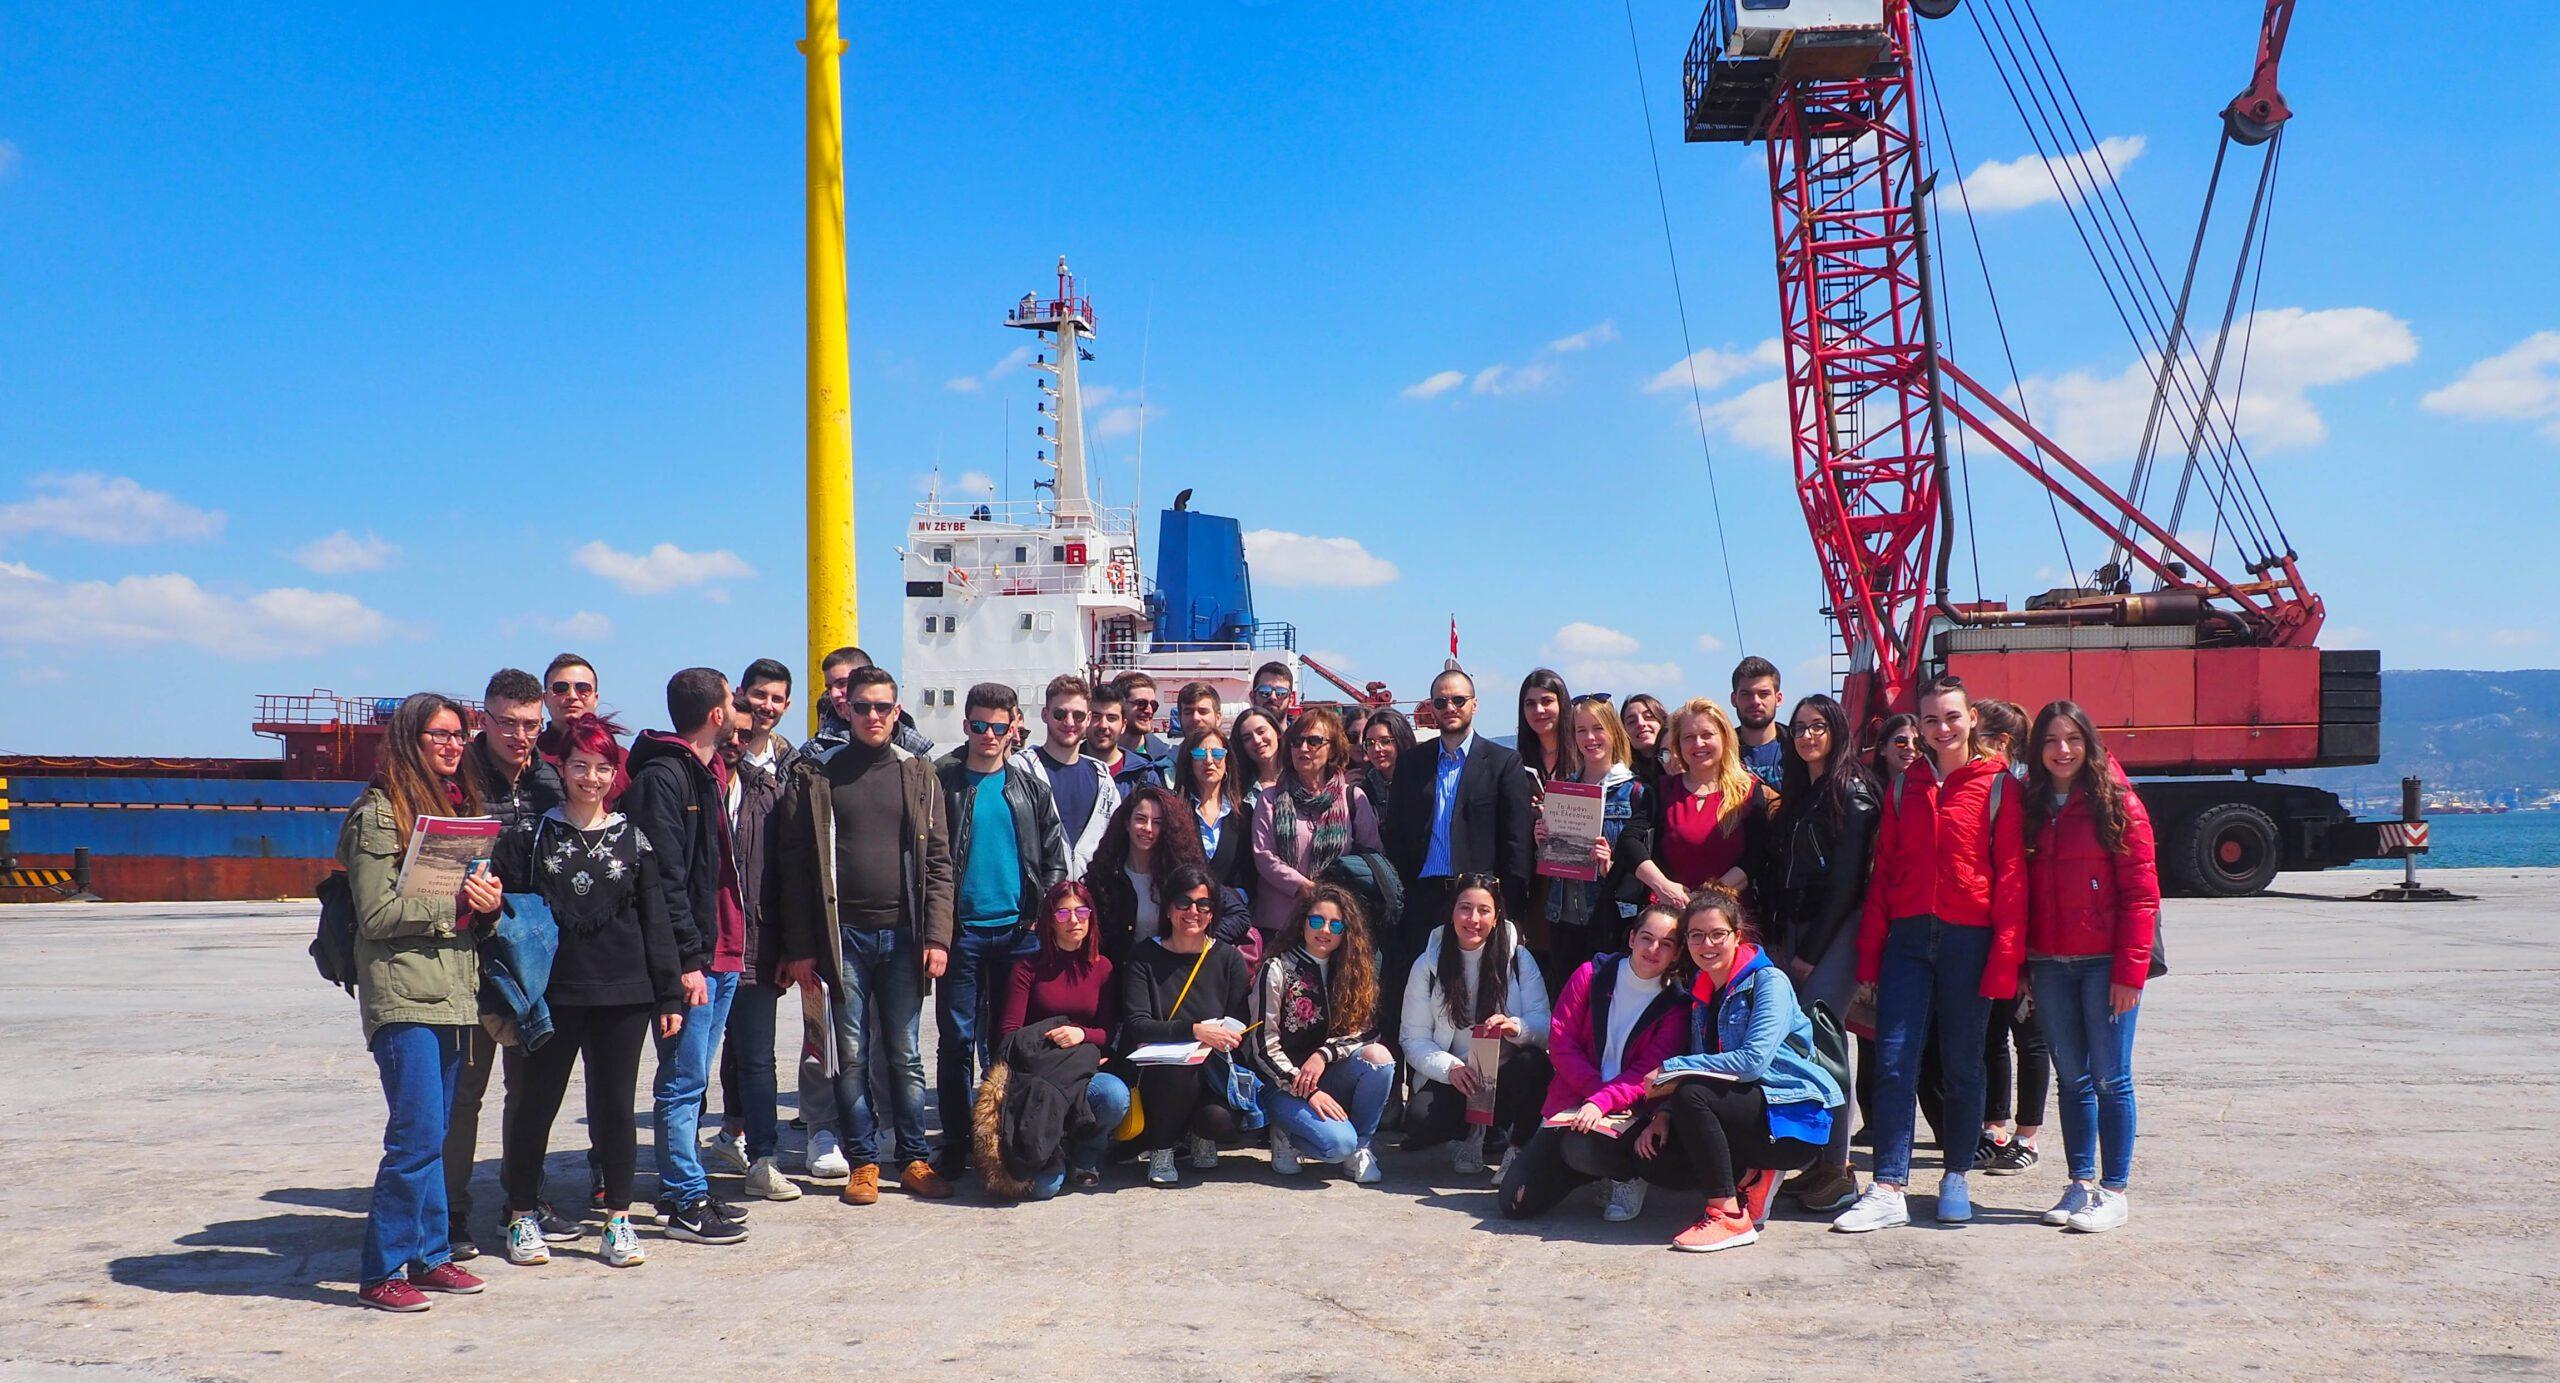 You are currently viewing Eπίσκεψη τριτοετών φοιτητών του Πανεπιστημίου Πειραιά στον Οργανισμό Λιμένος Ελευσίνας Α.Ε.